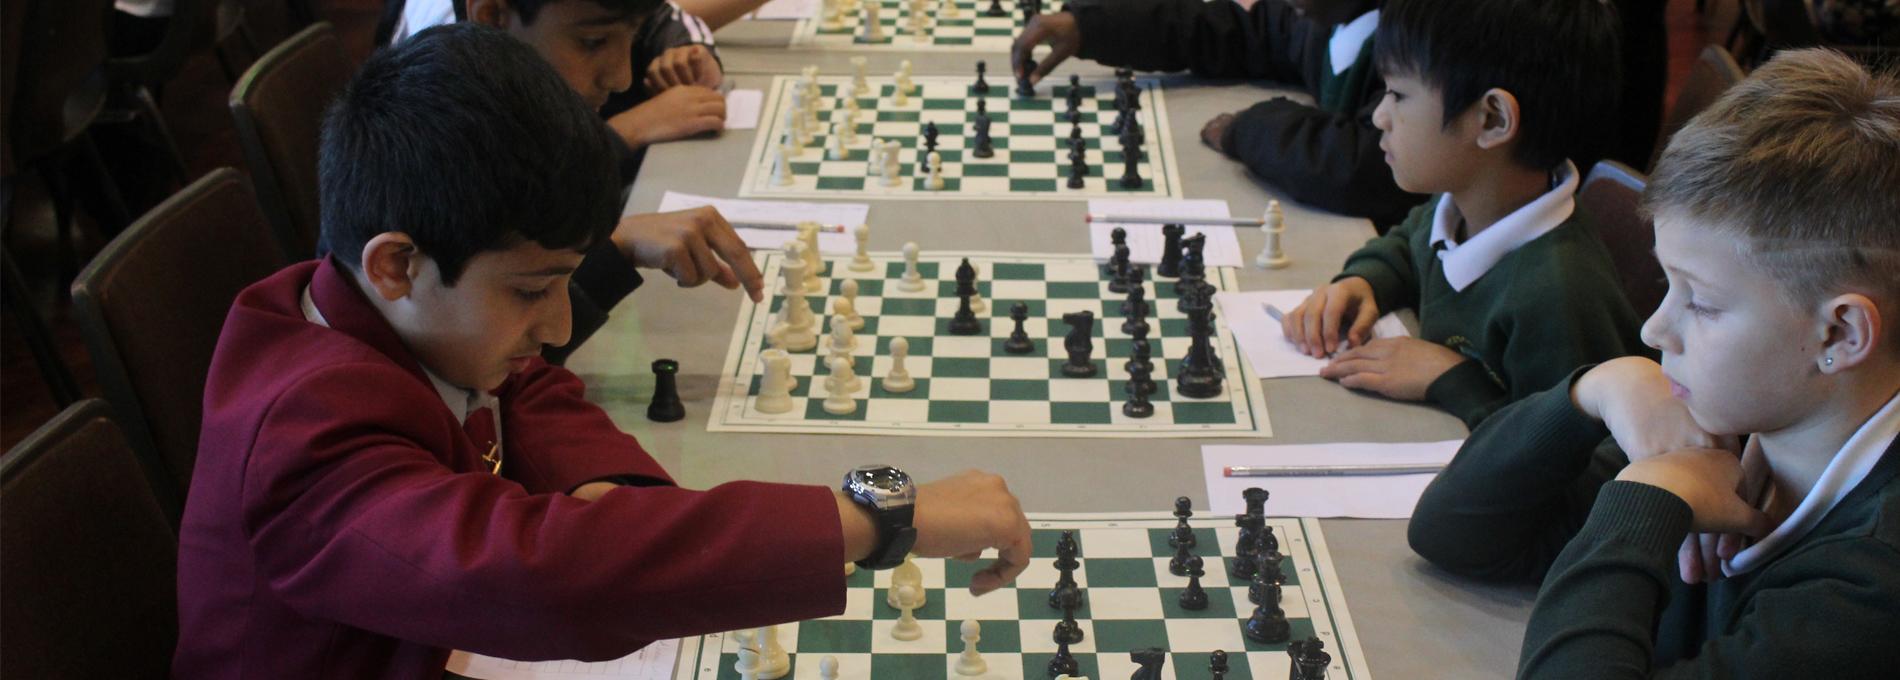 Chess - King Edward's School